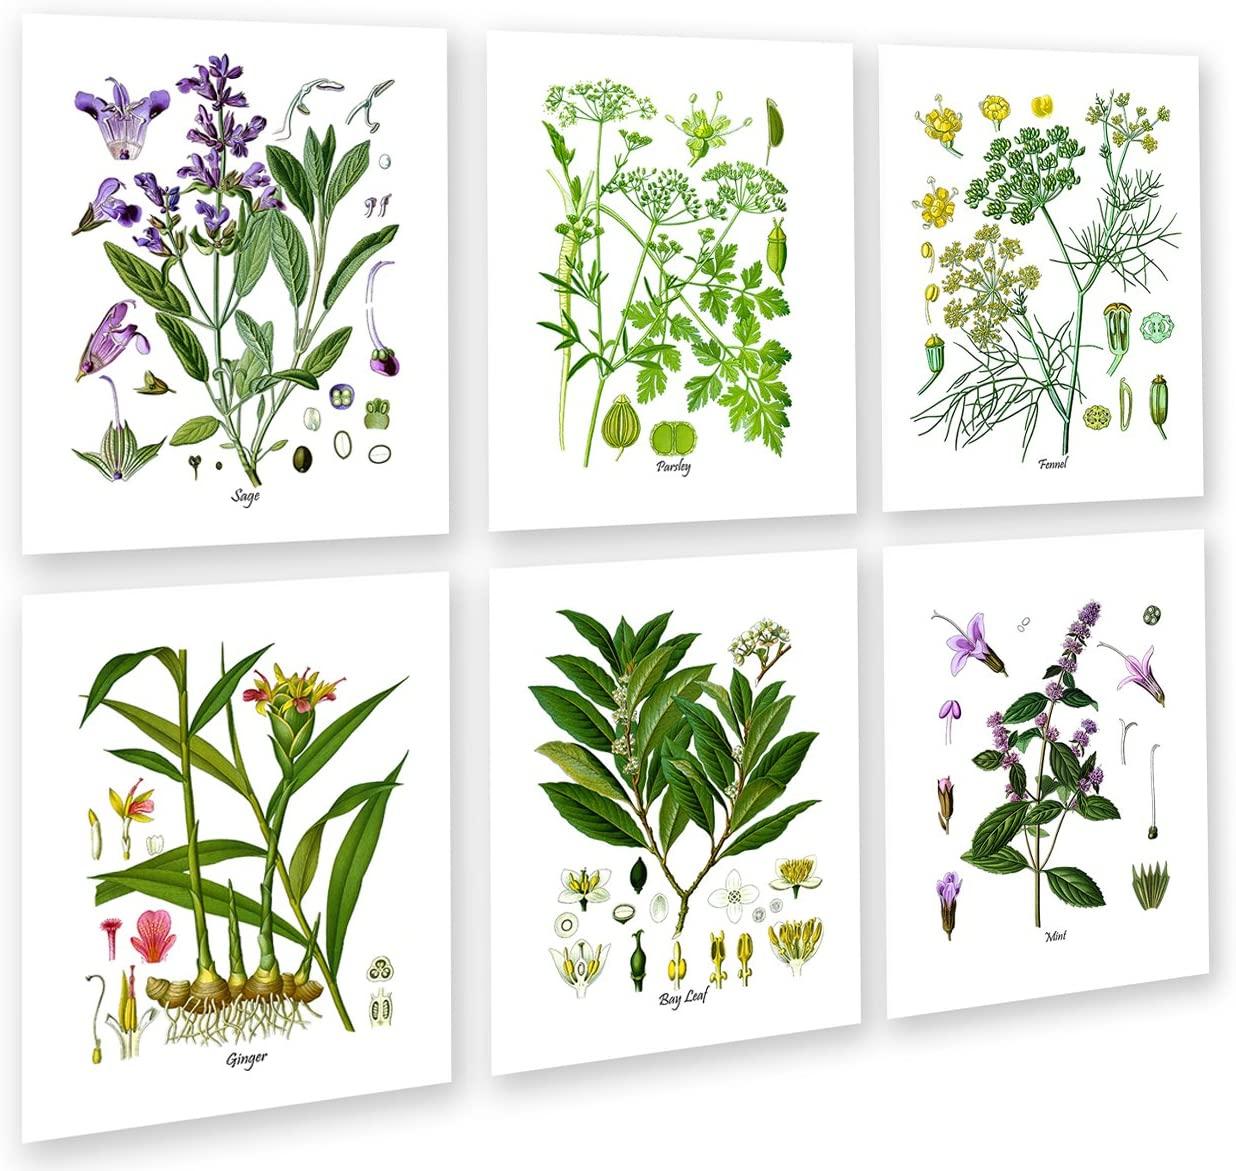 Botanical Herb Prints Wall Art Set of 6 Unframed Botanical Prints Kitchen Wall Decor